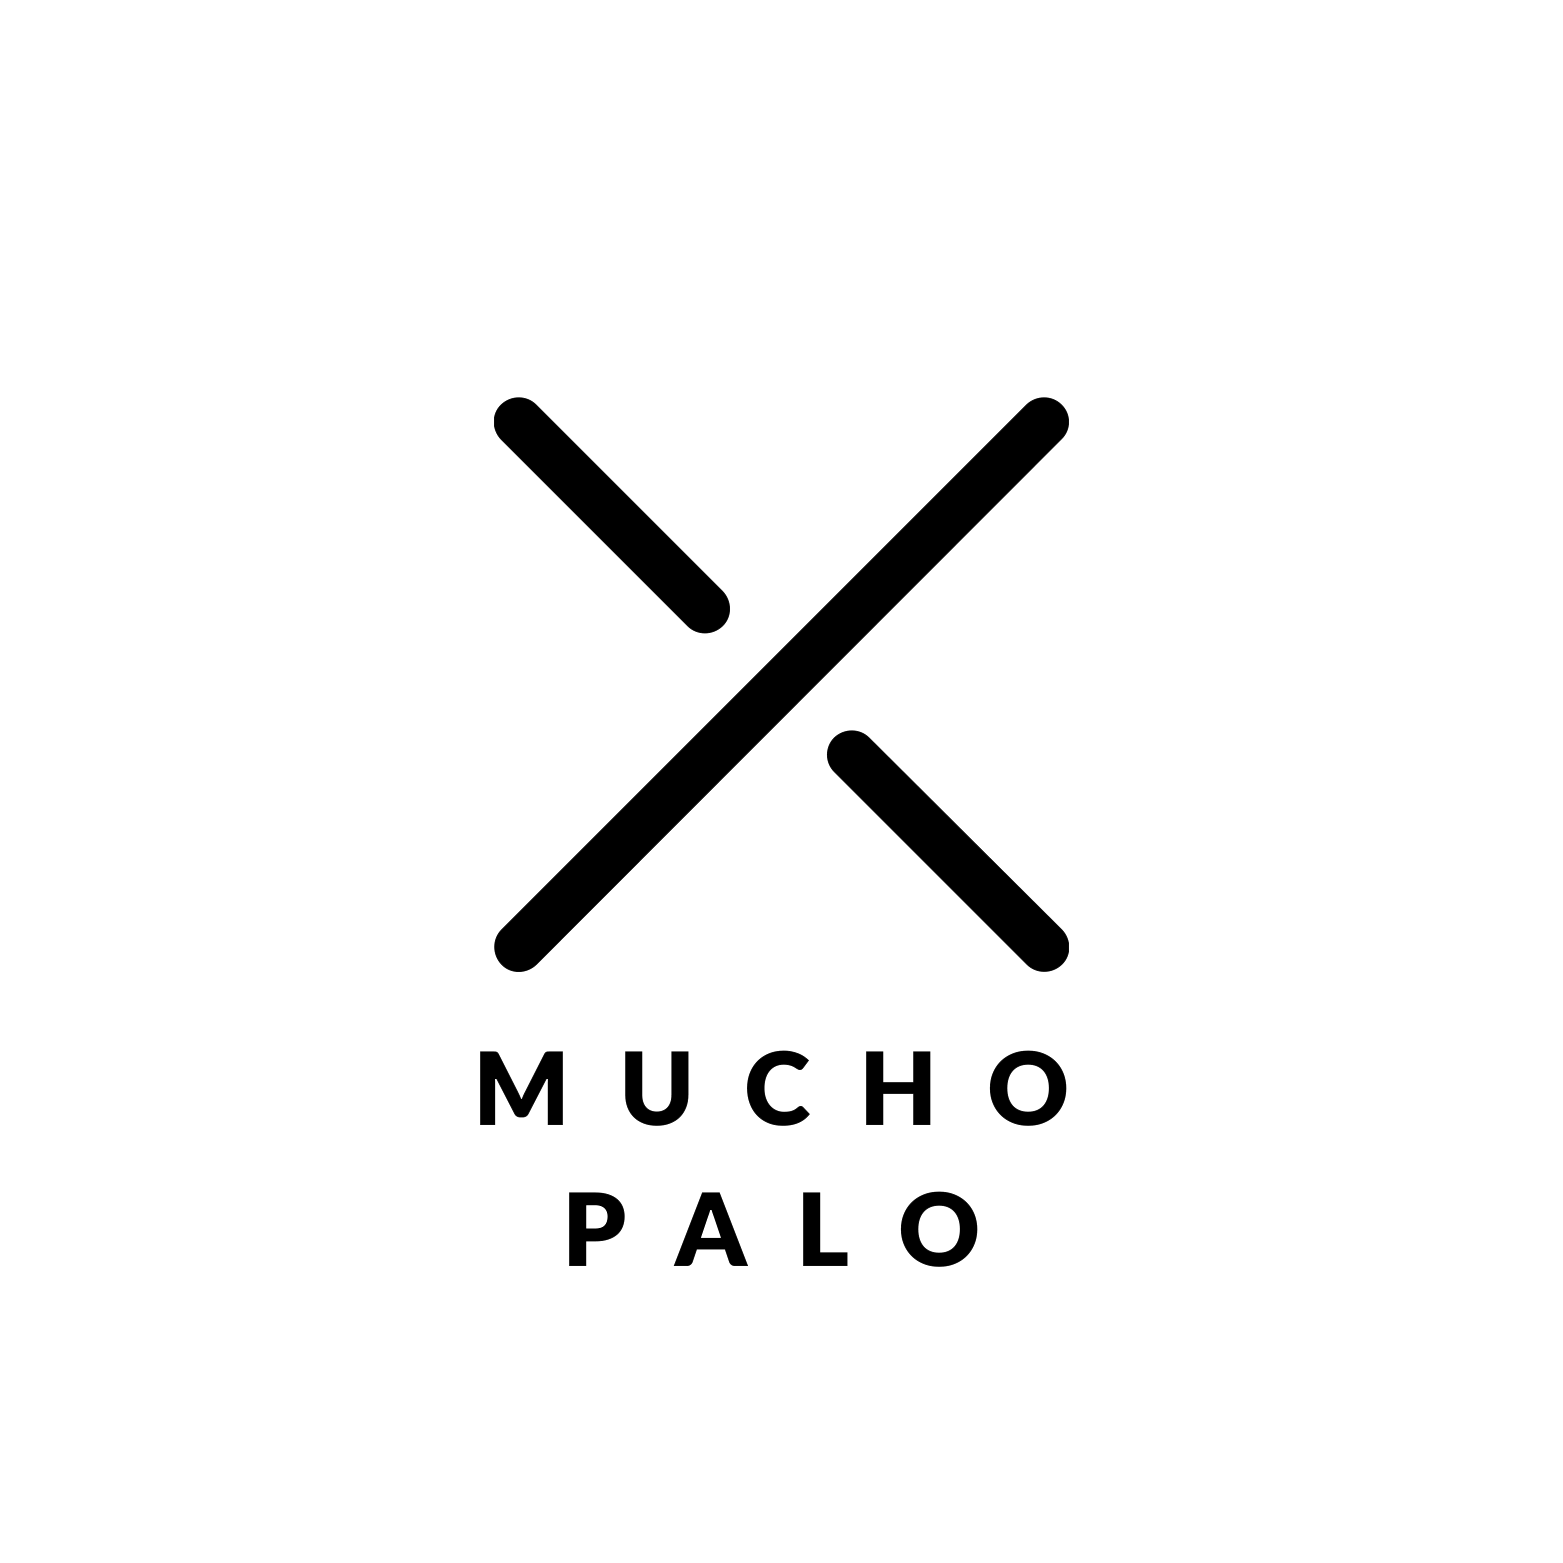 Logompp